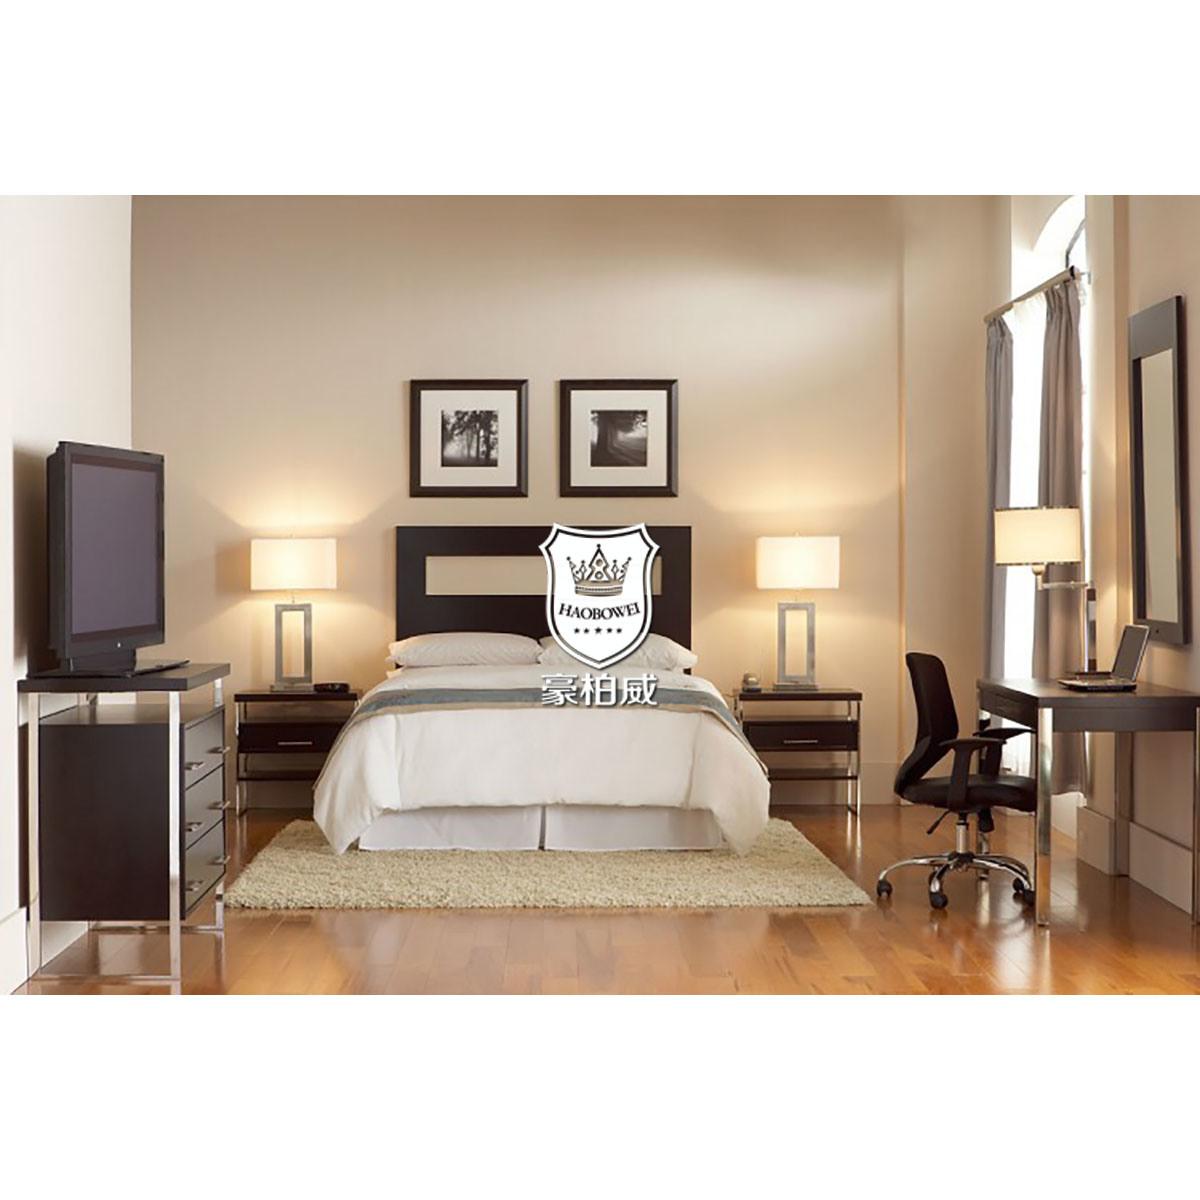 5 Star Modern Design Hotel Bedroom Wooden Furniture For Sale C04 China Hotel Furniture Used Hotel Furniture For Sale Made In China Com